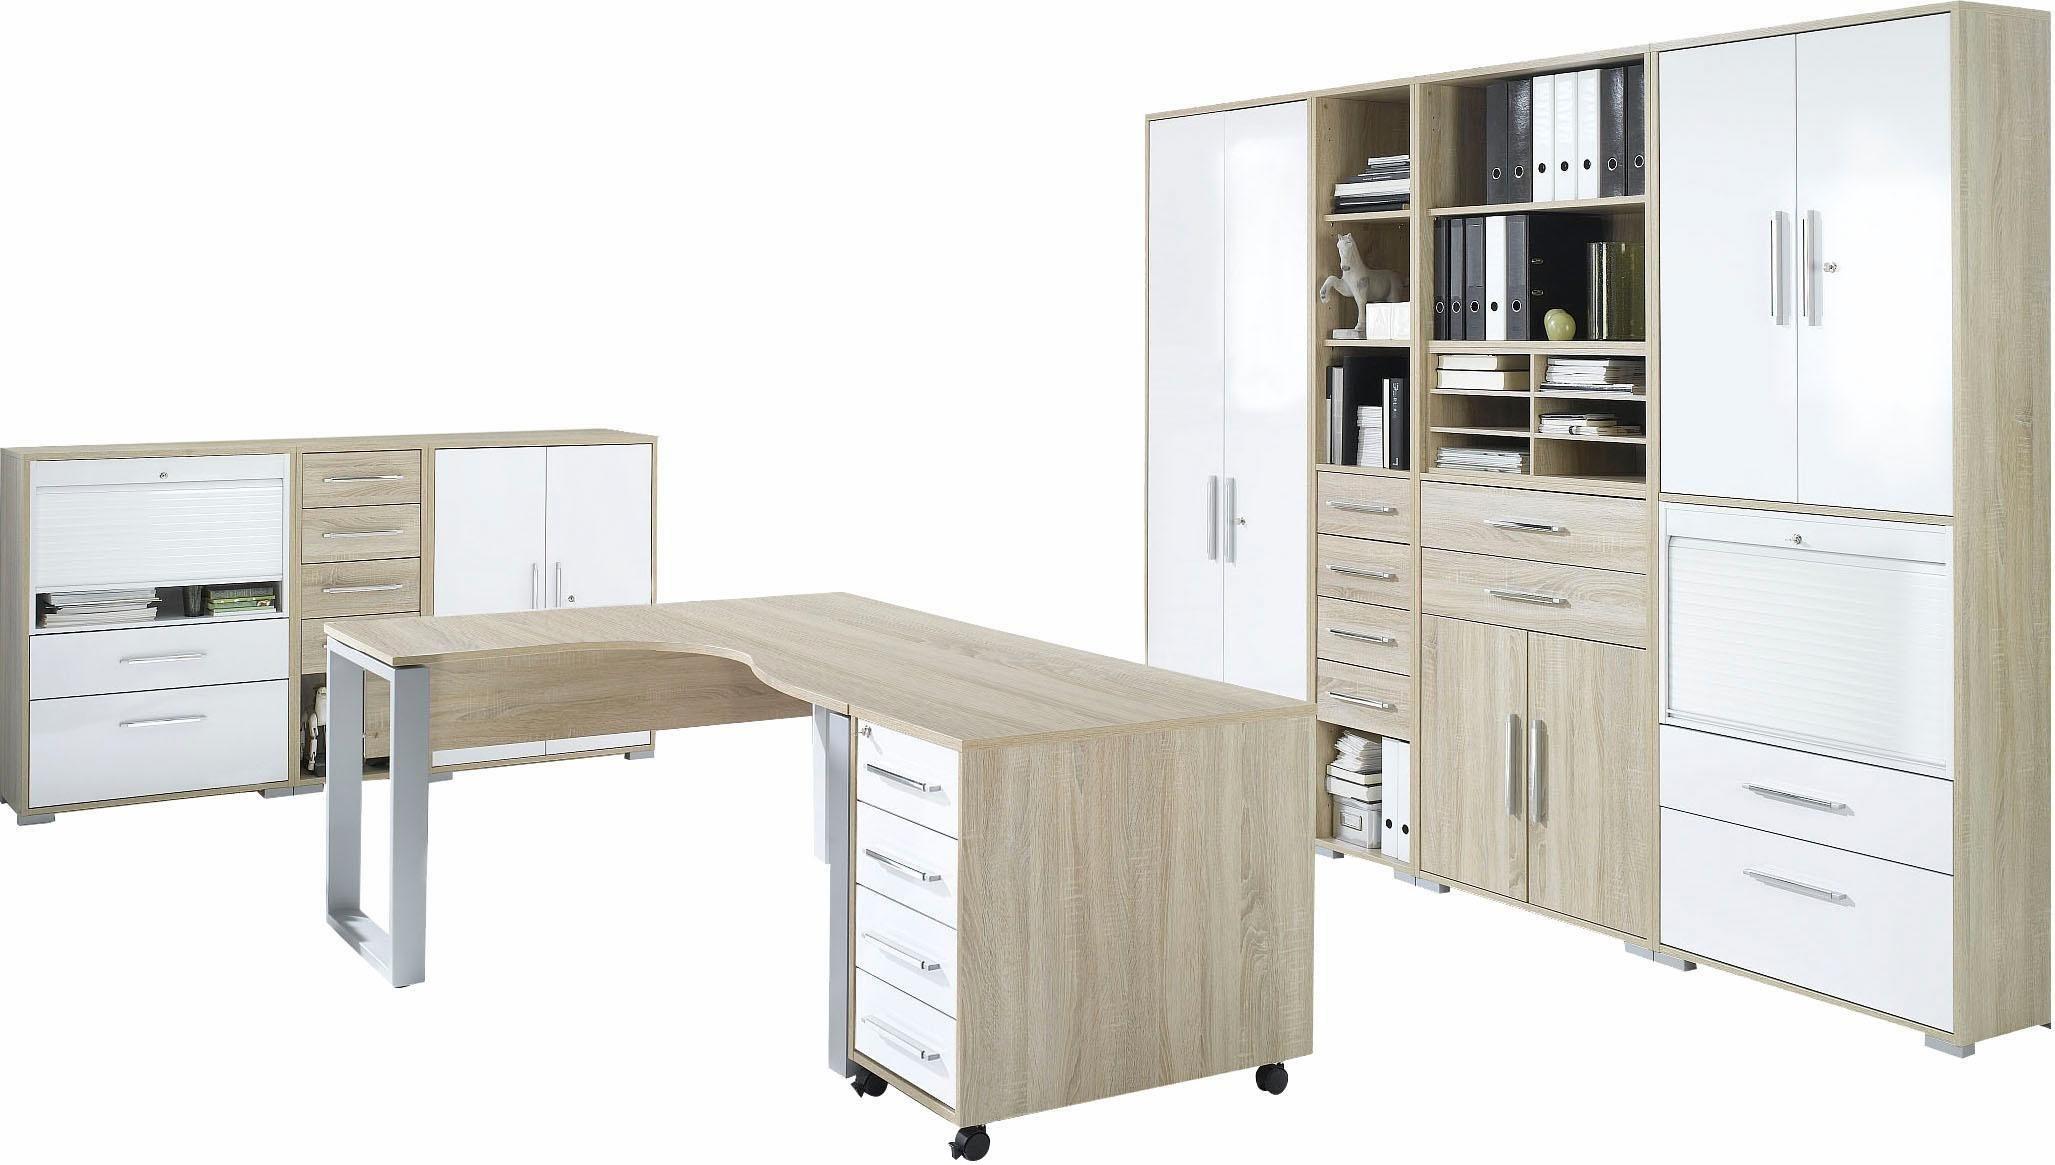 Maja Möbel Büromöbel-Set »1210 SYSTEM« (9-tlg.) | Büro > Büromöbel-Serien | Weiß | Sonoma - Eiche - Kunststoff - Abs | Maja Möbel